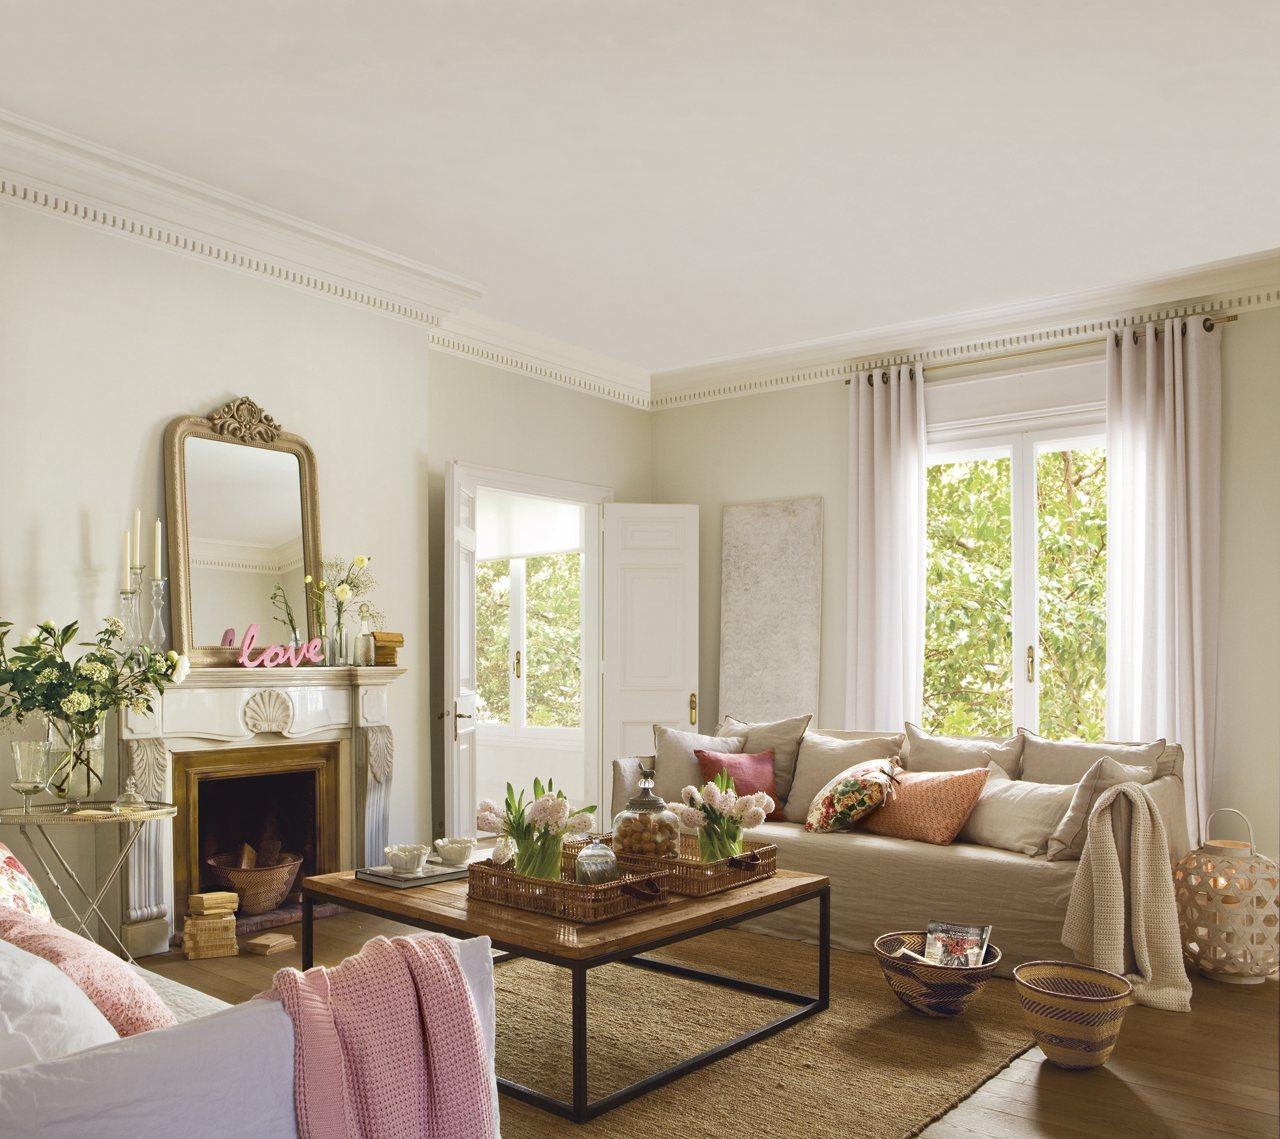 Una preciosa vivienda de estilo cl sico renovado etxekodeco - Molduras para chimeneas ...